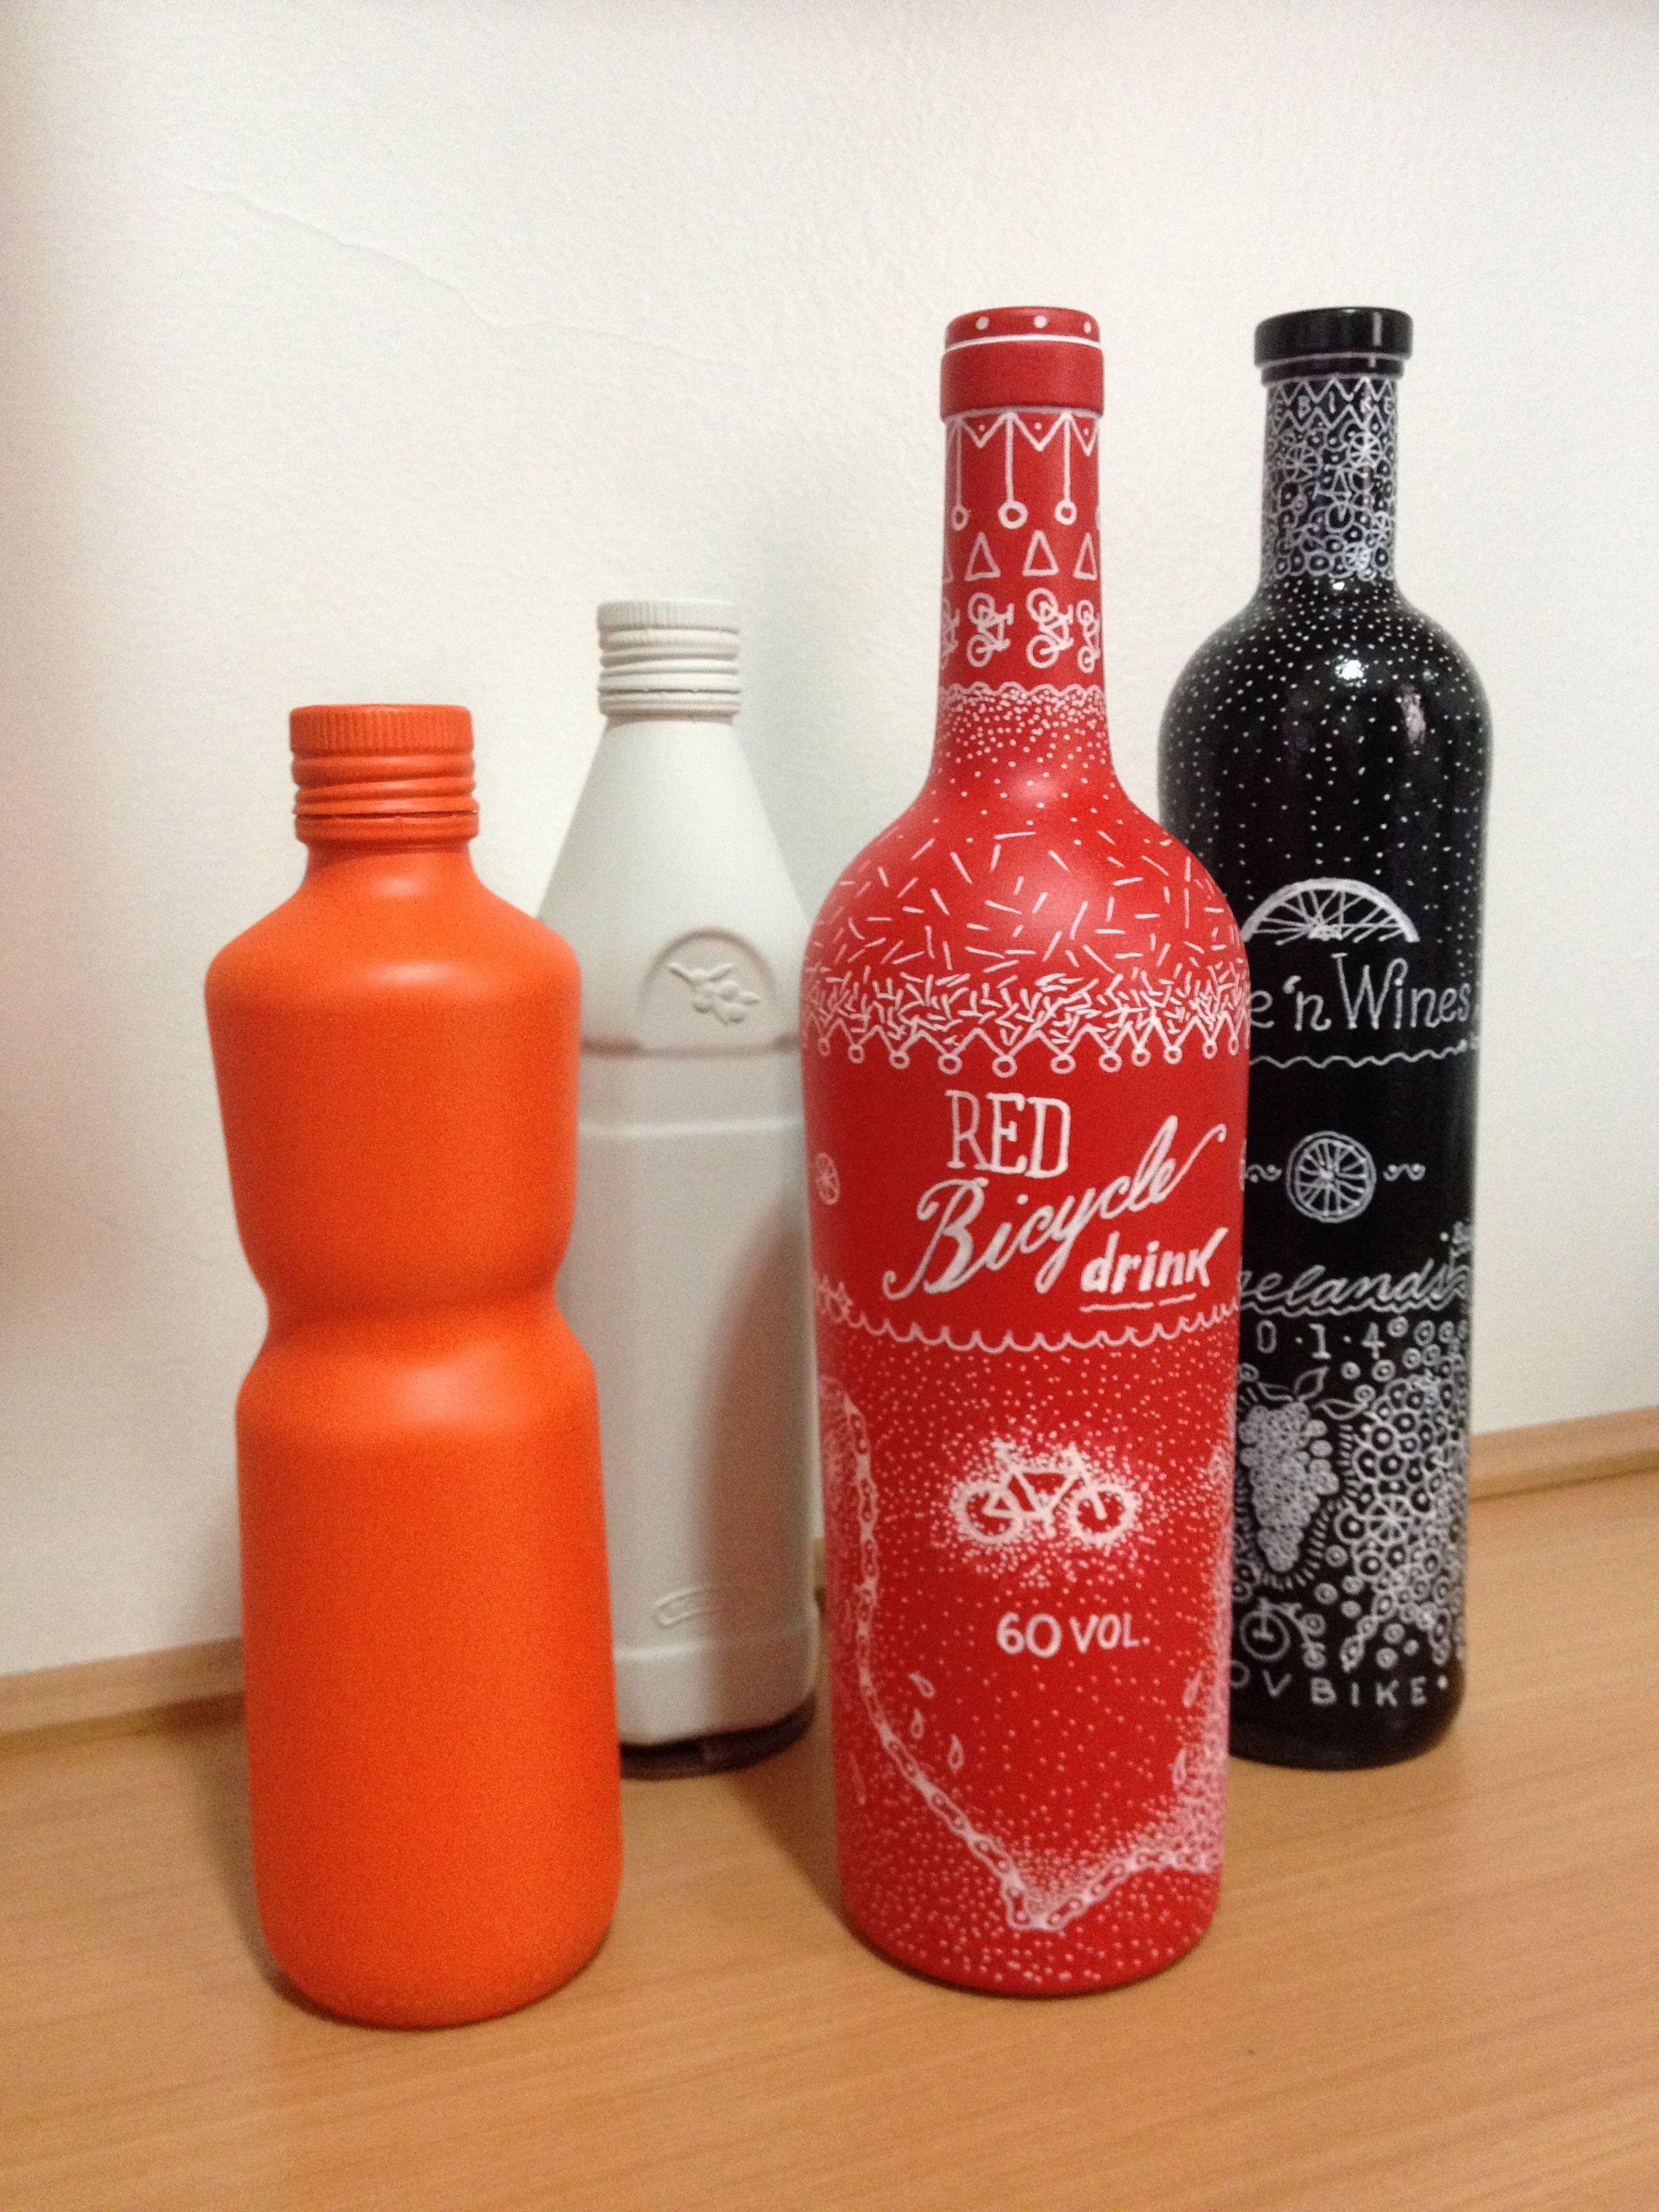 Garrafas Ilustradas Sauce Bottle Bottles Decoration Hot Sauce Bottles